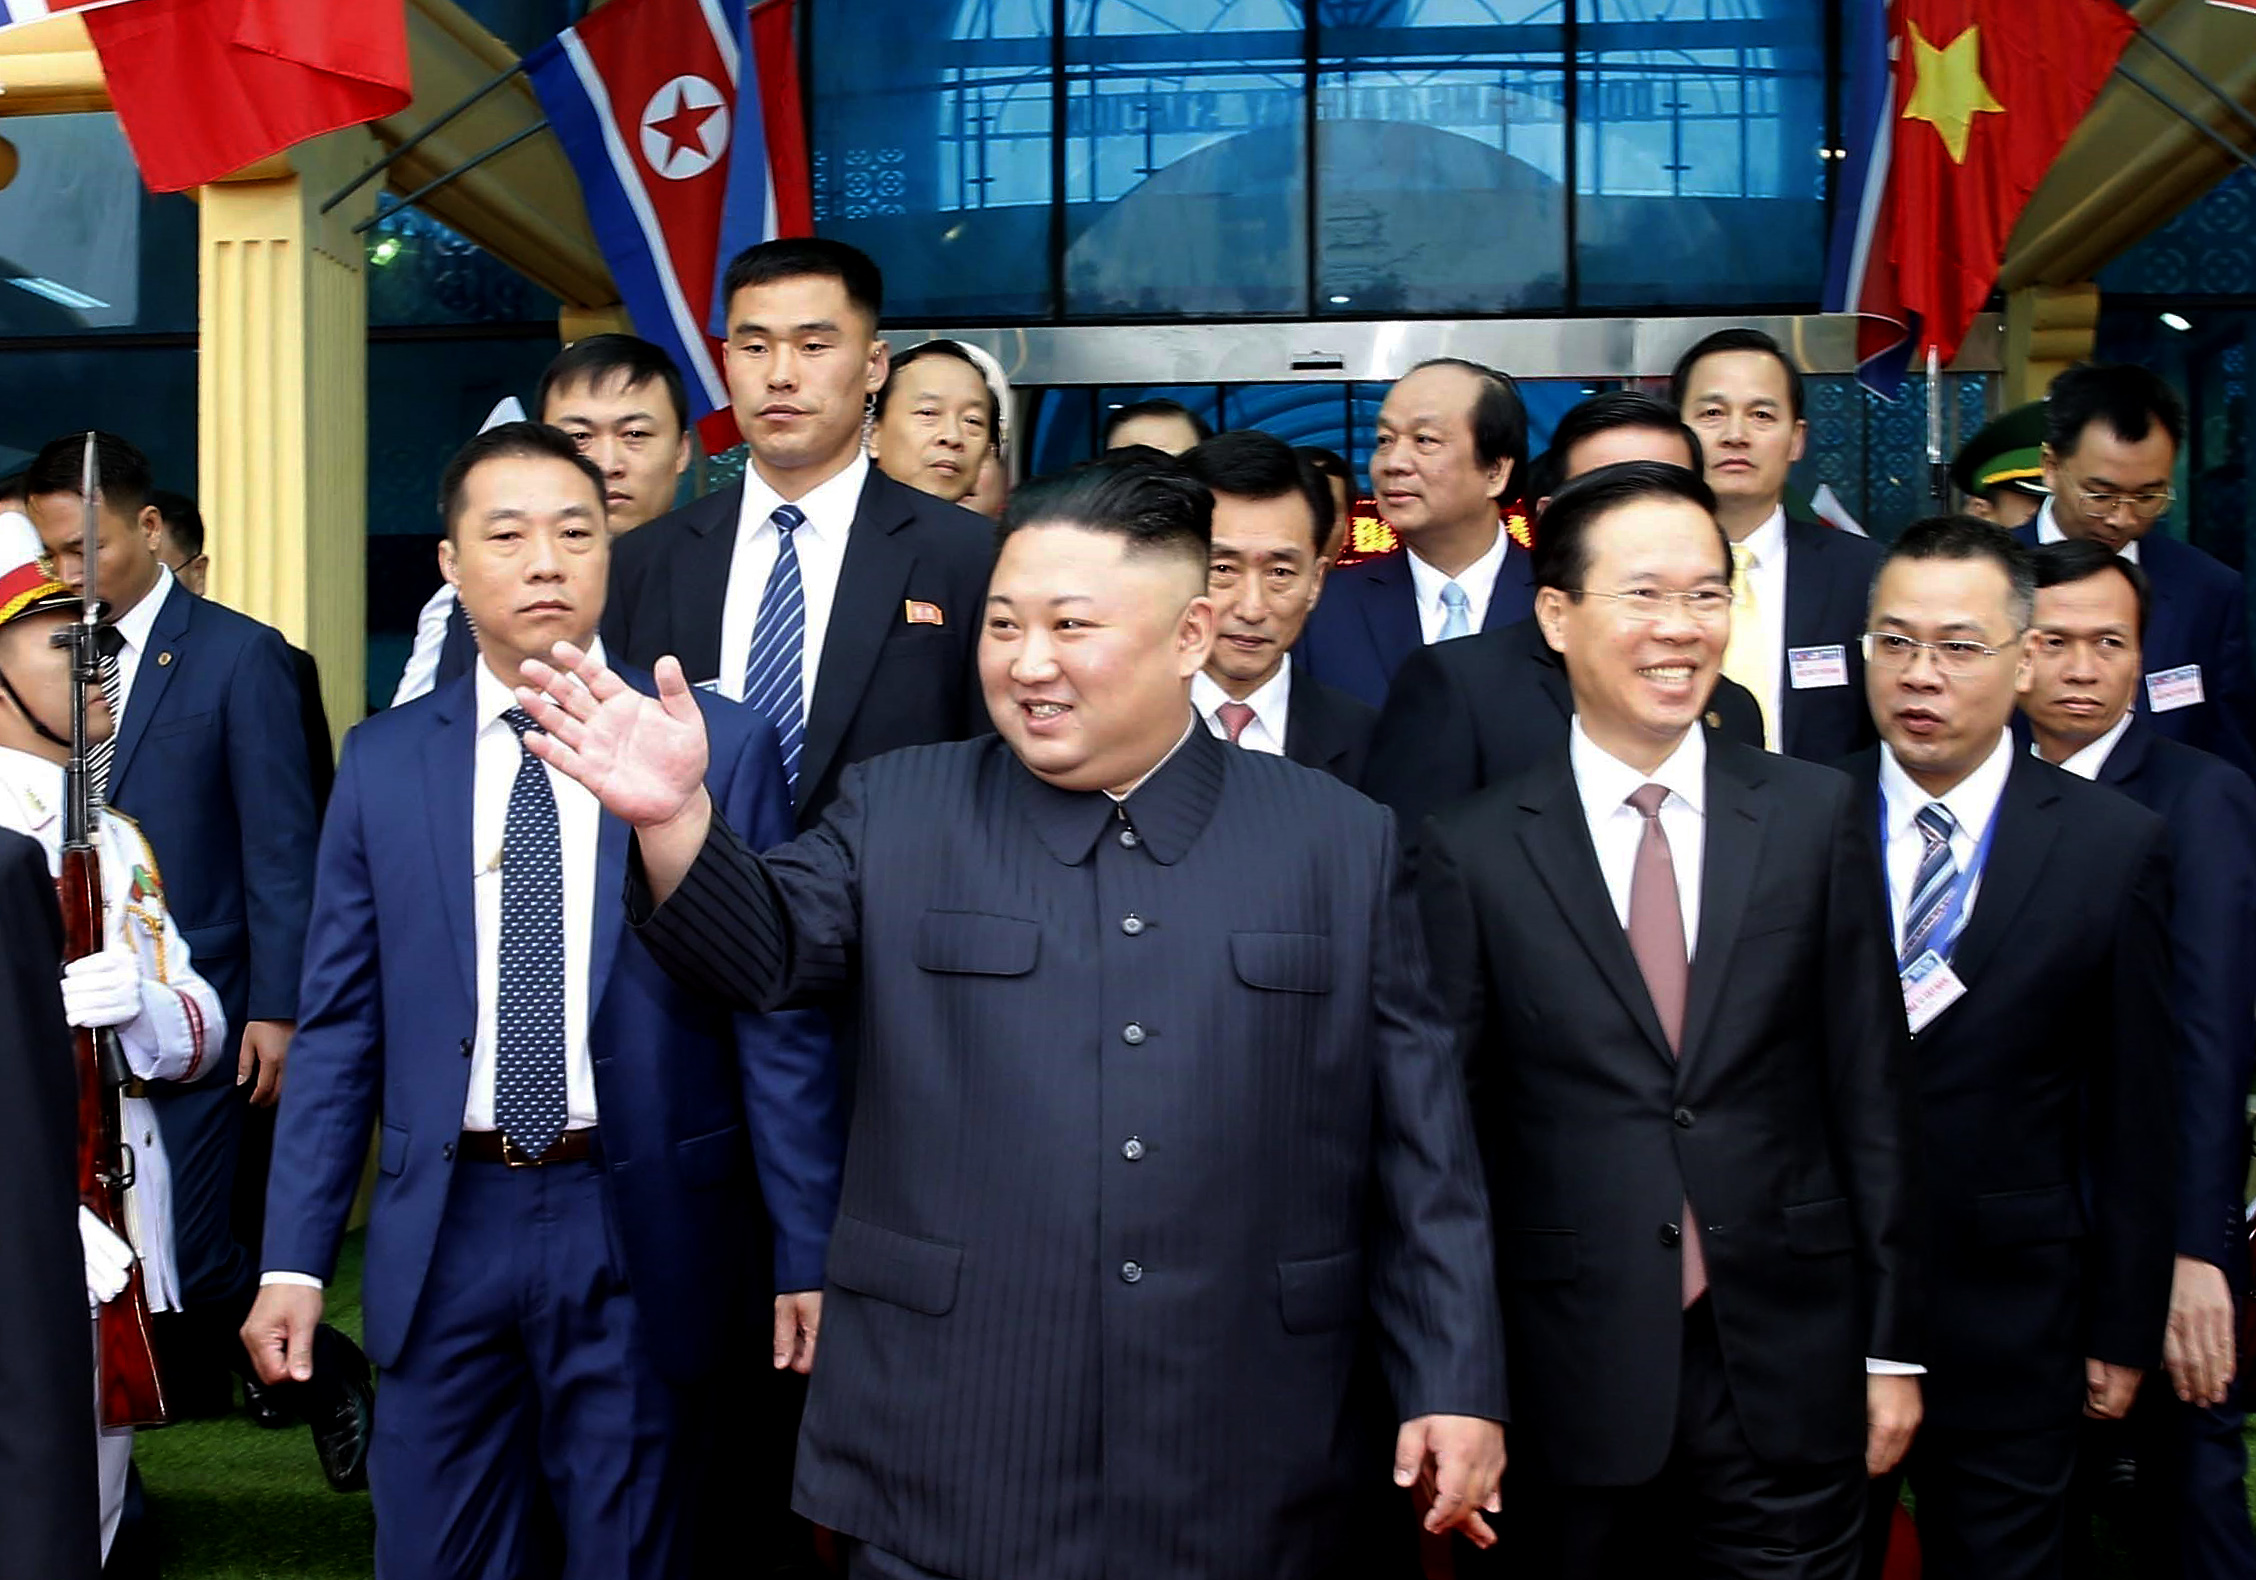 Hanoi - Kim Jong Un Arrives In Vietnam For Summit With Trump